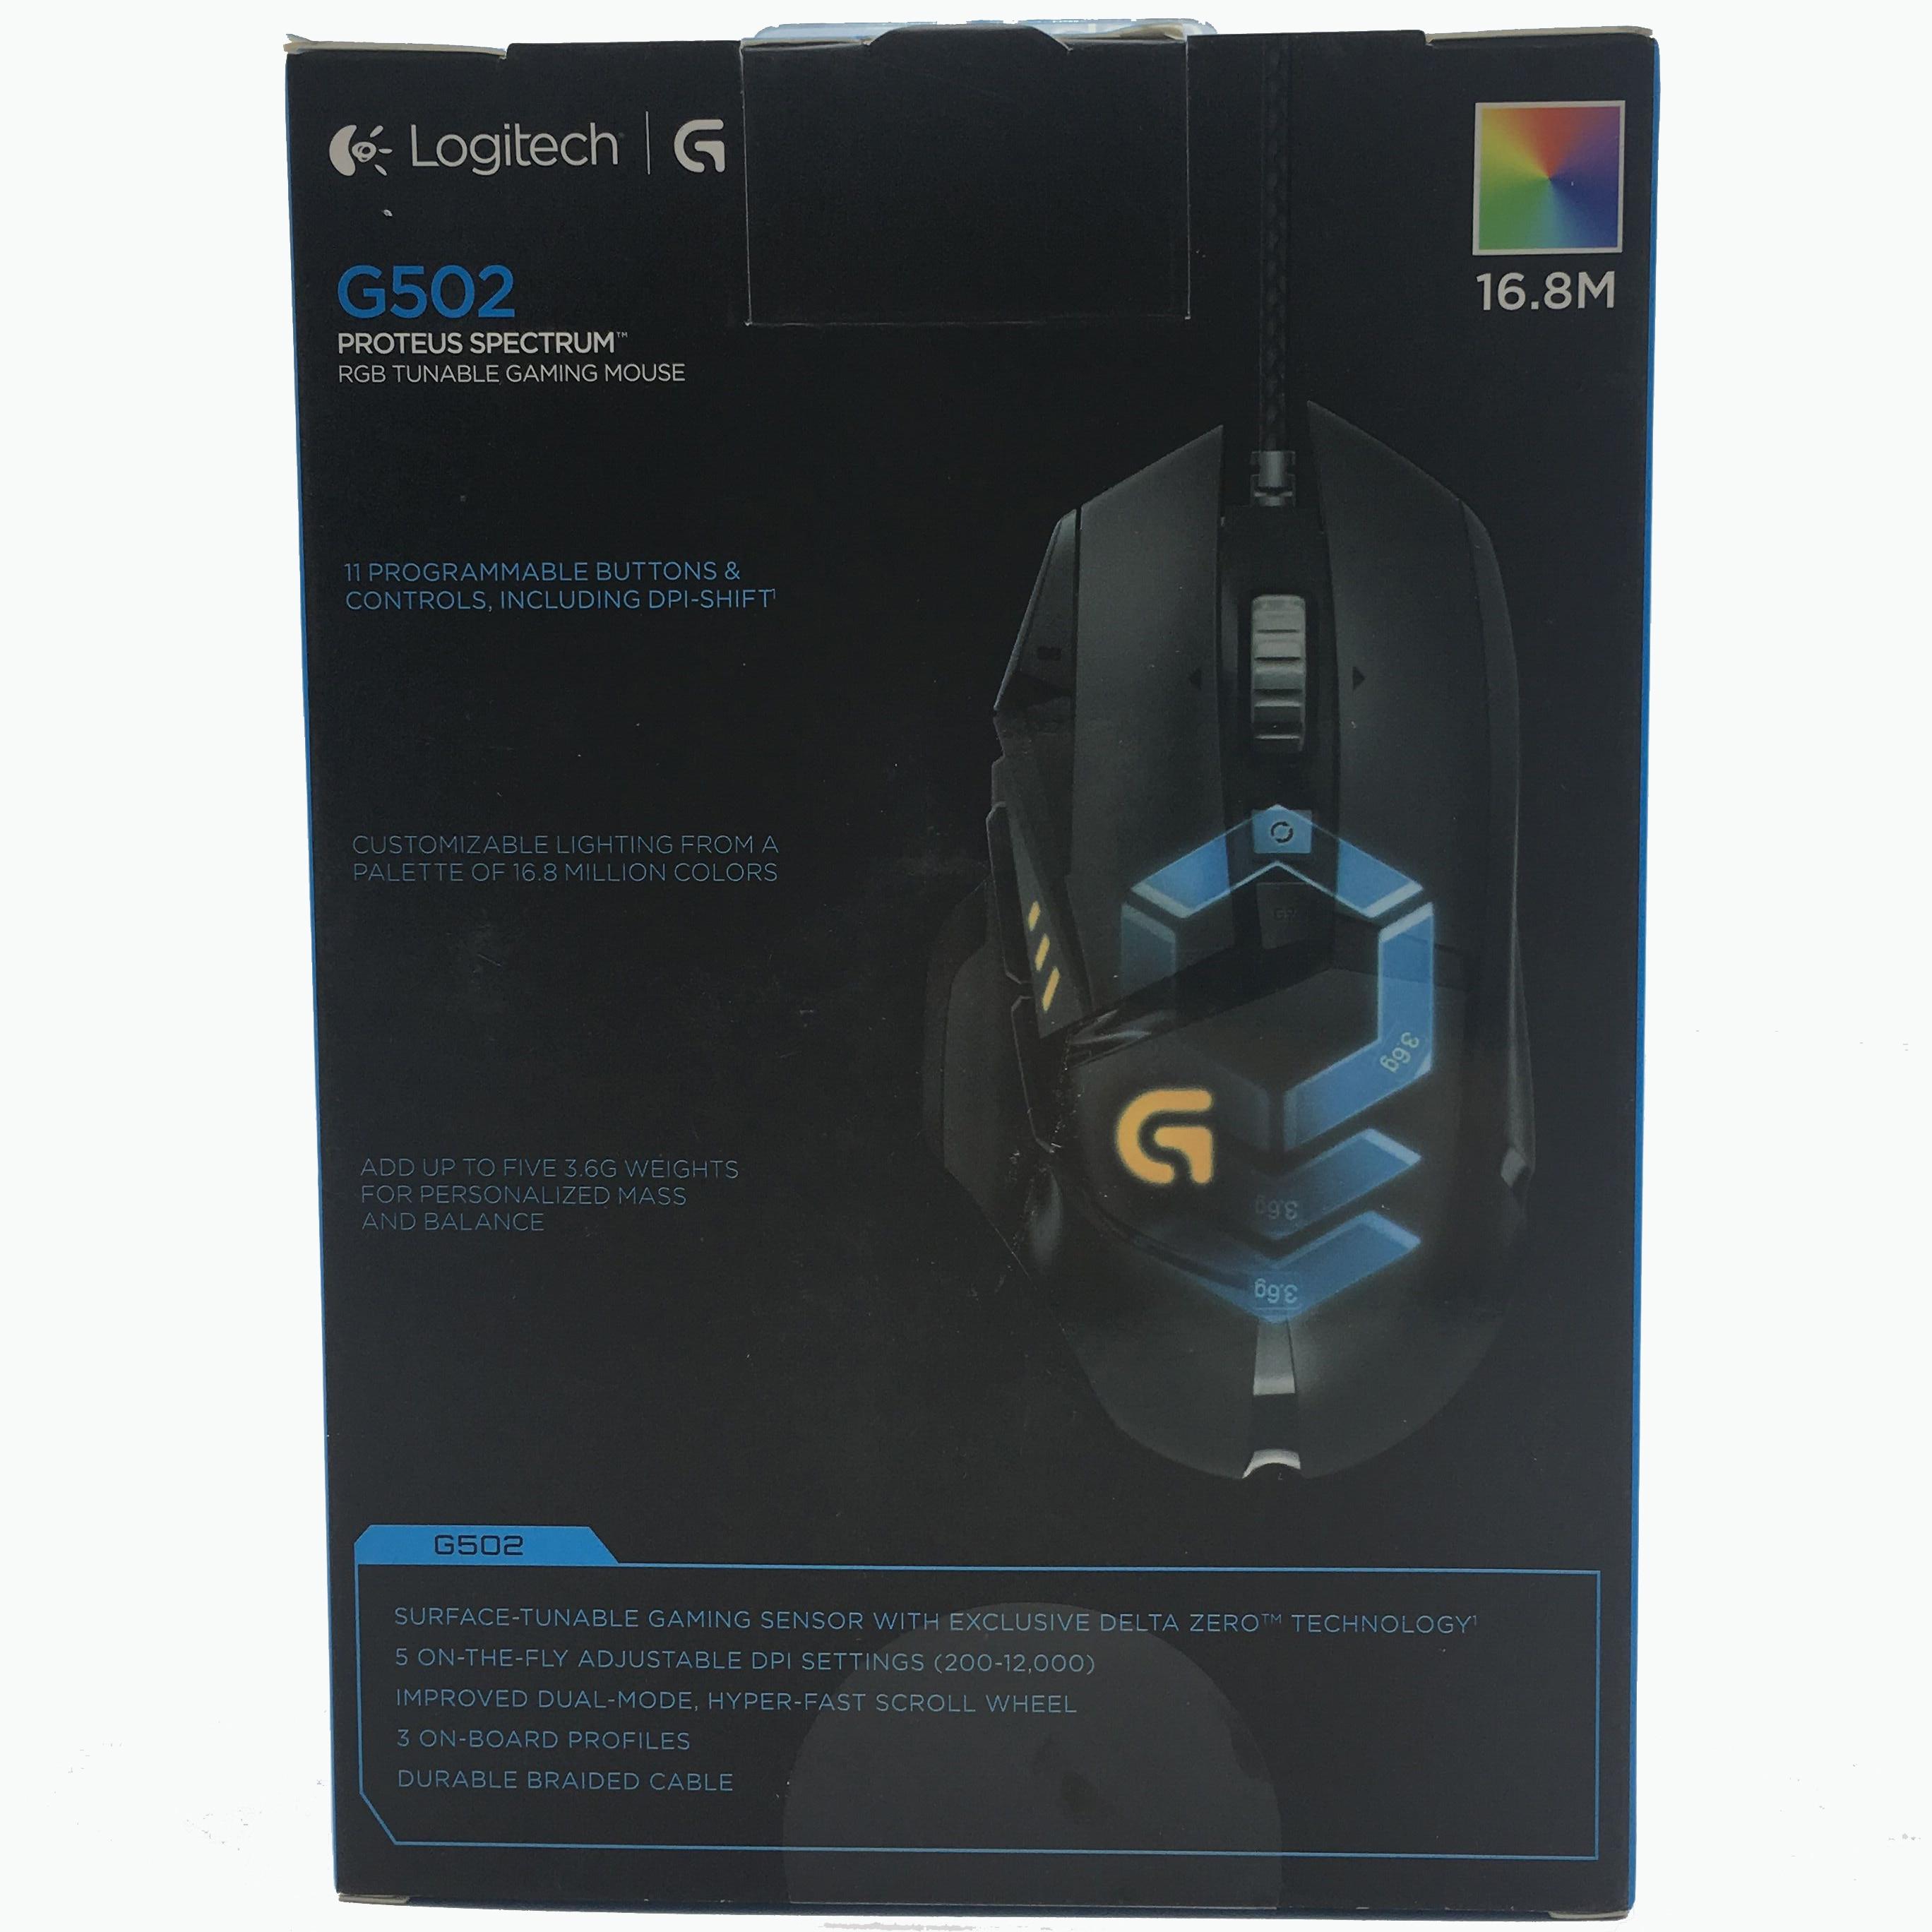 100% genuino Inglese imballaggio Logitech G502 RGB LED Proteus Spettro Laser Sintonizzabile Gaming mouse USB Wired 12000DPI Gamer mouse - 2